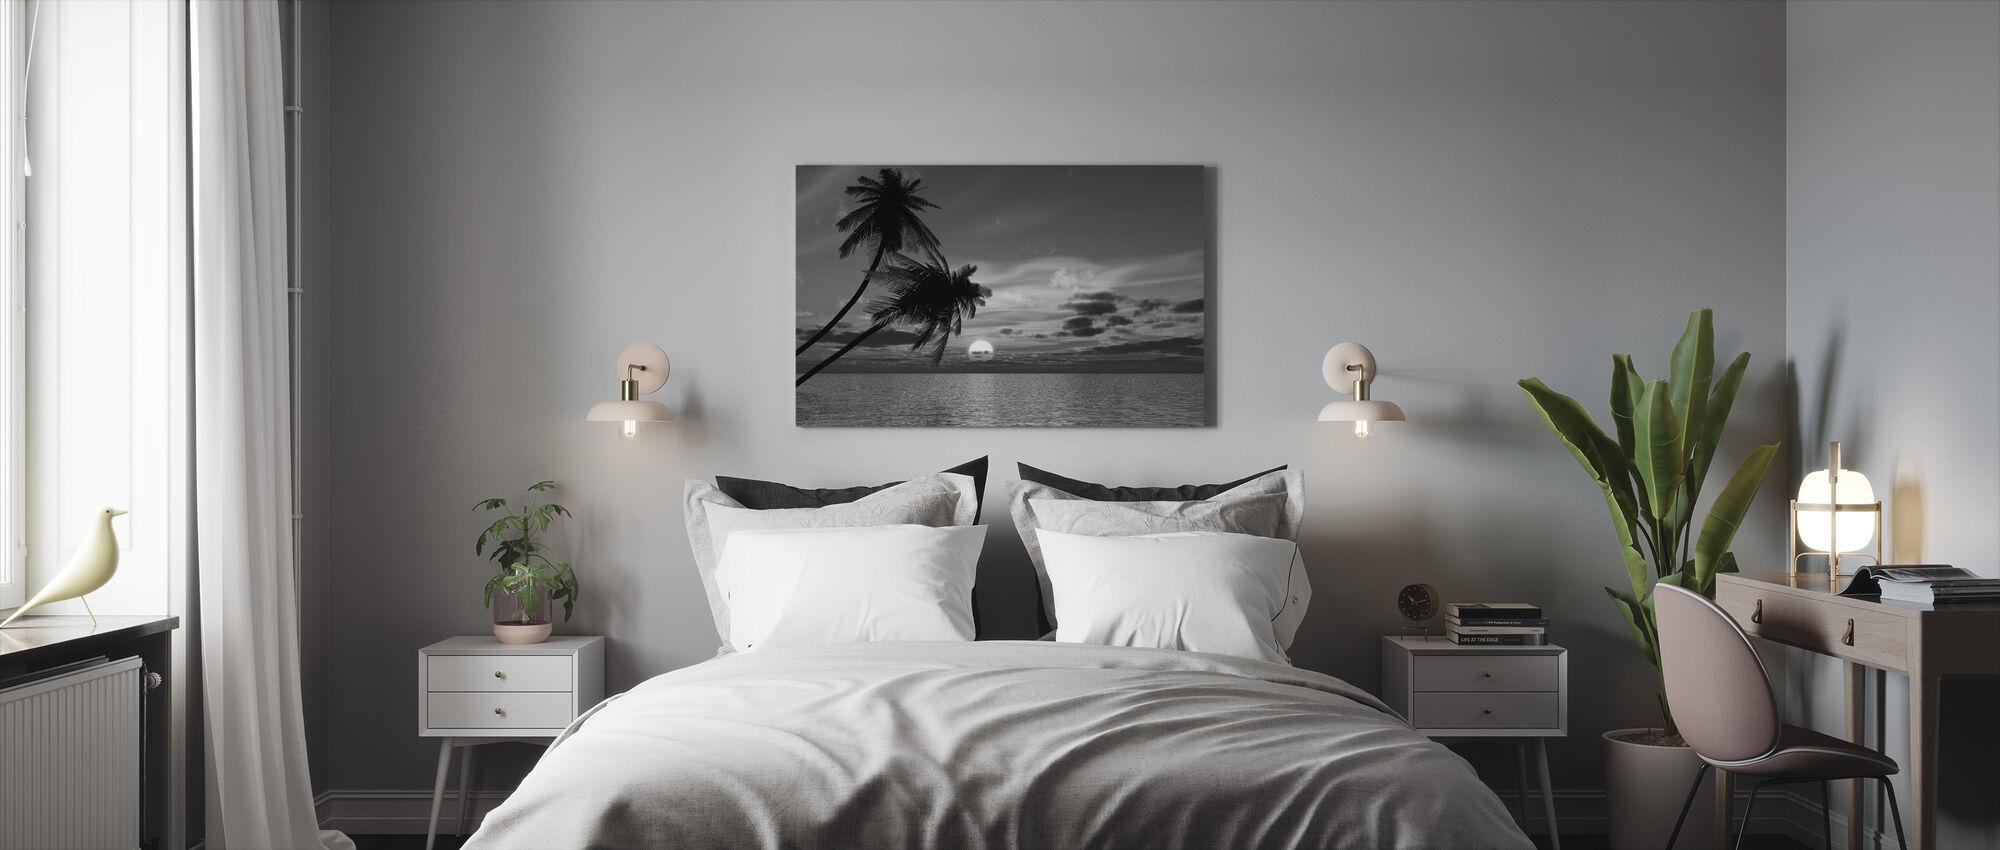 Kookospalmu aurinko - Canvastaulu - Makuuhuone